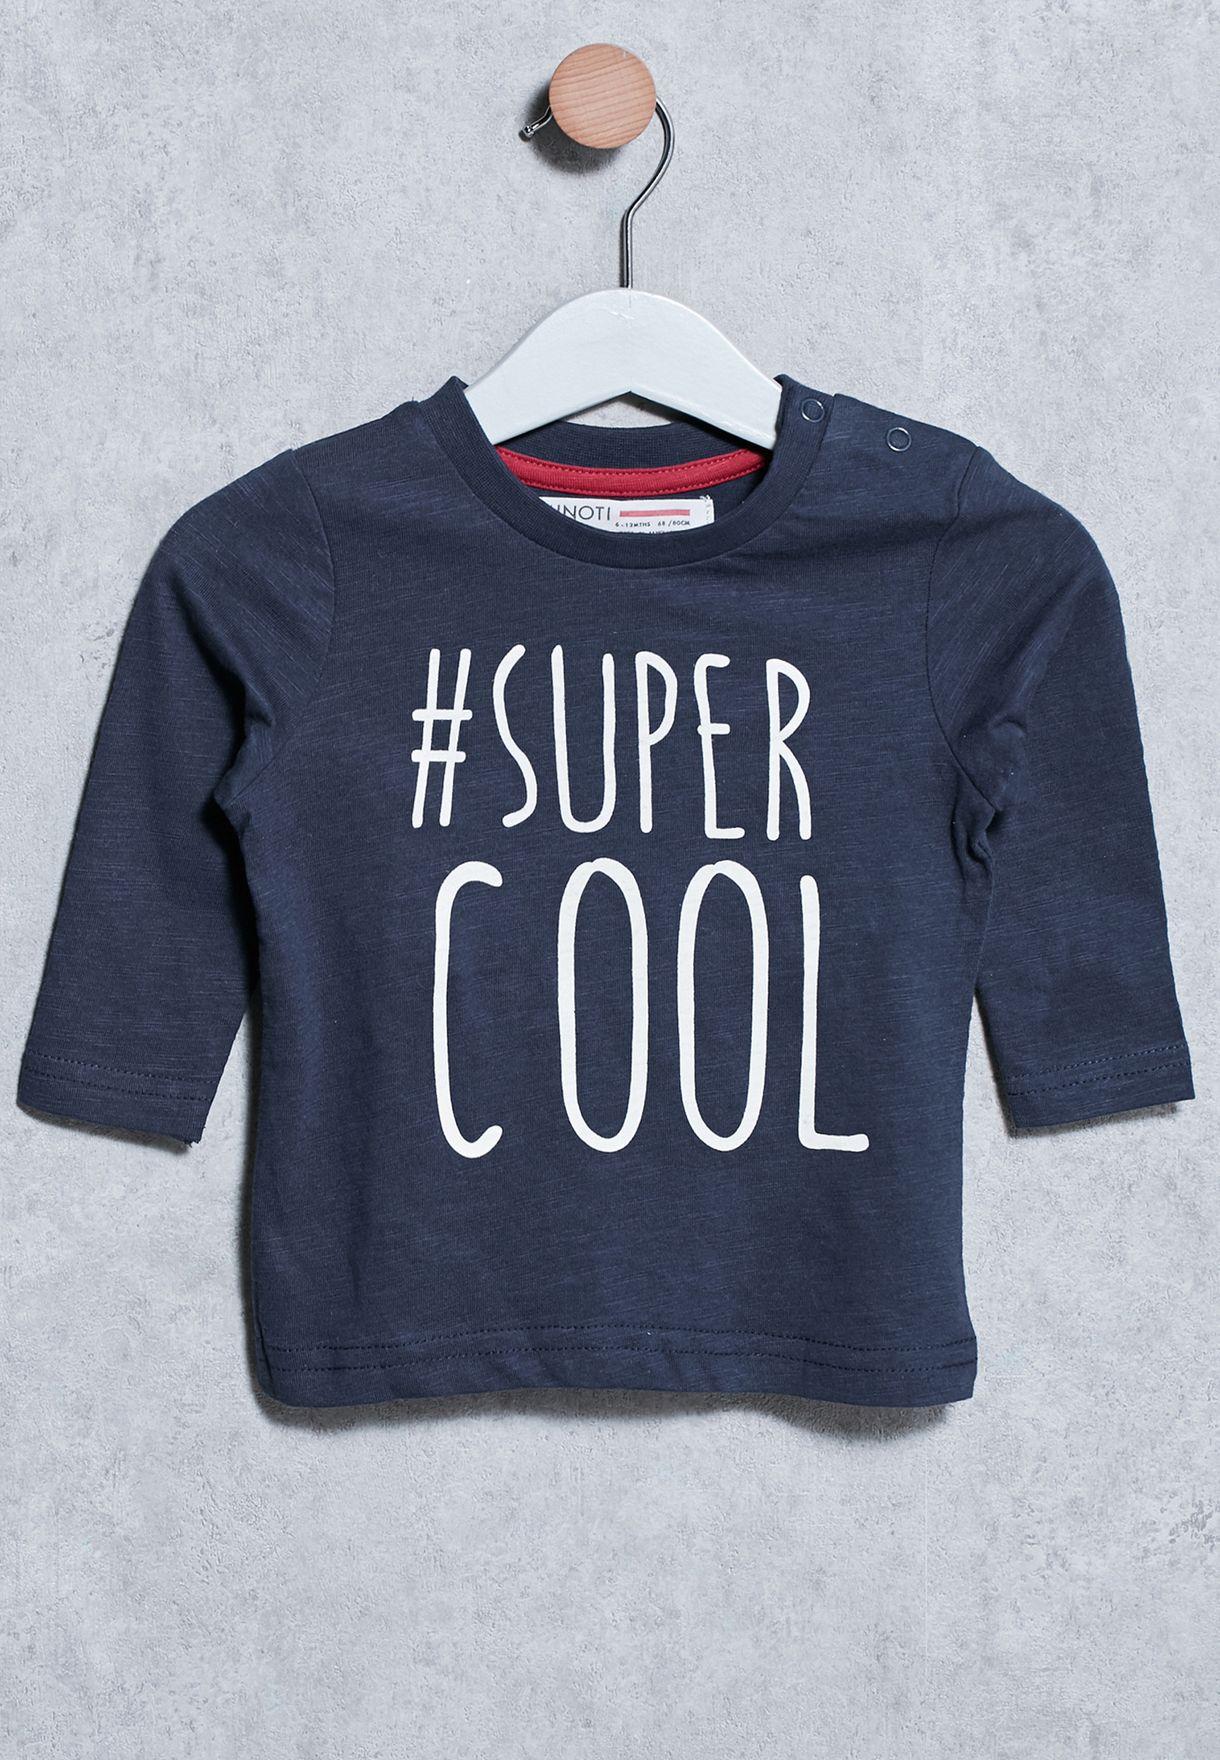 8ec5a4e34 Shop Minoti navy Infant Super Cool T-Shirt for Kids in UAE ...